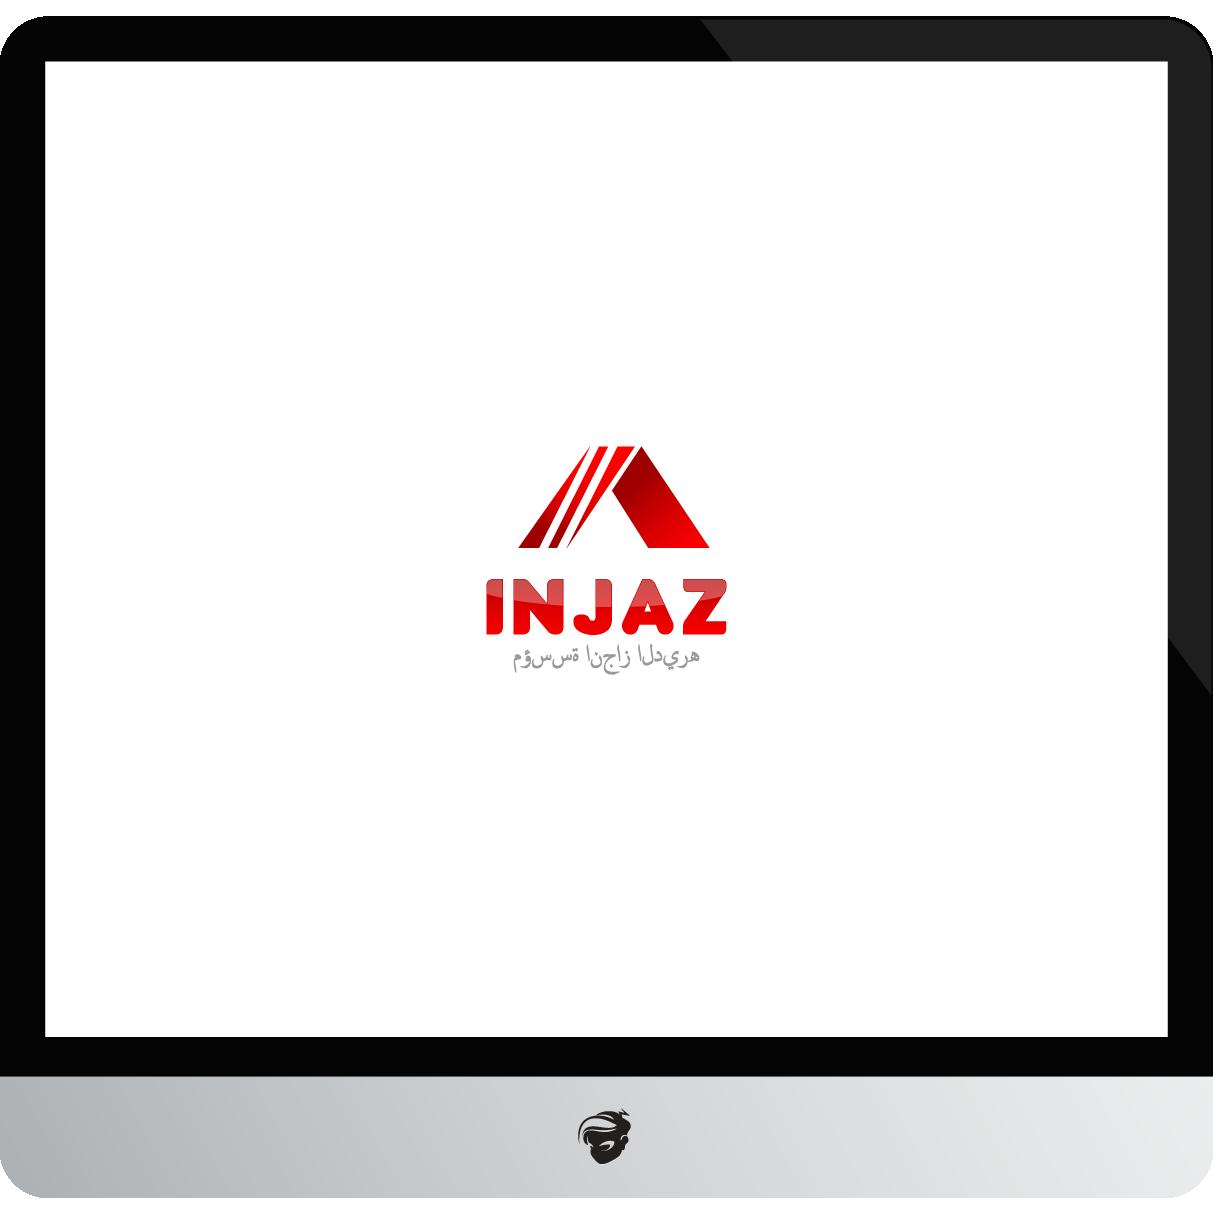 Logo Design by zesthar - Entry No. 48 in the Logo Design Contest Fun Logo Design for Injaz aldeera.